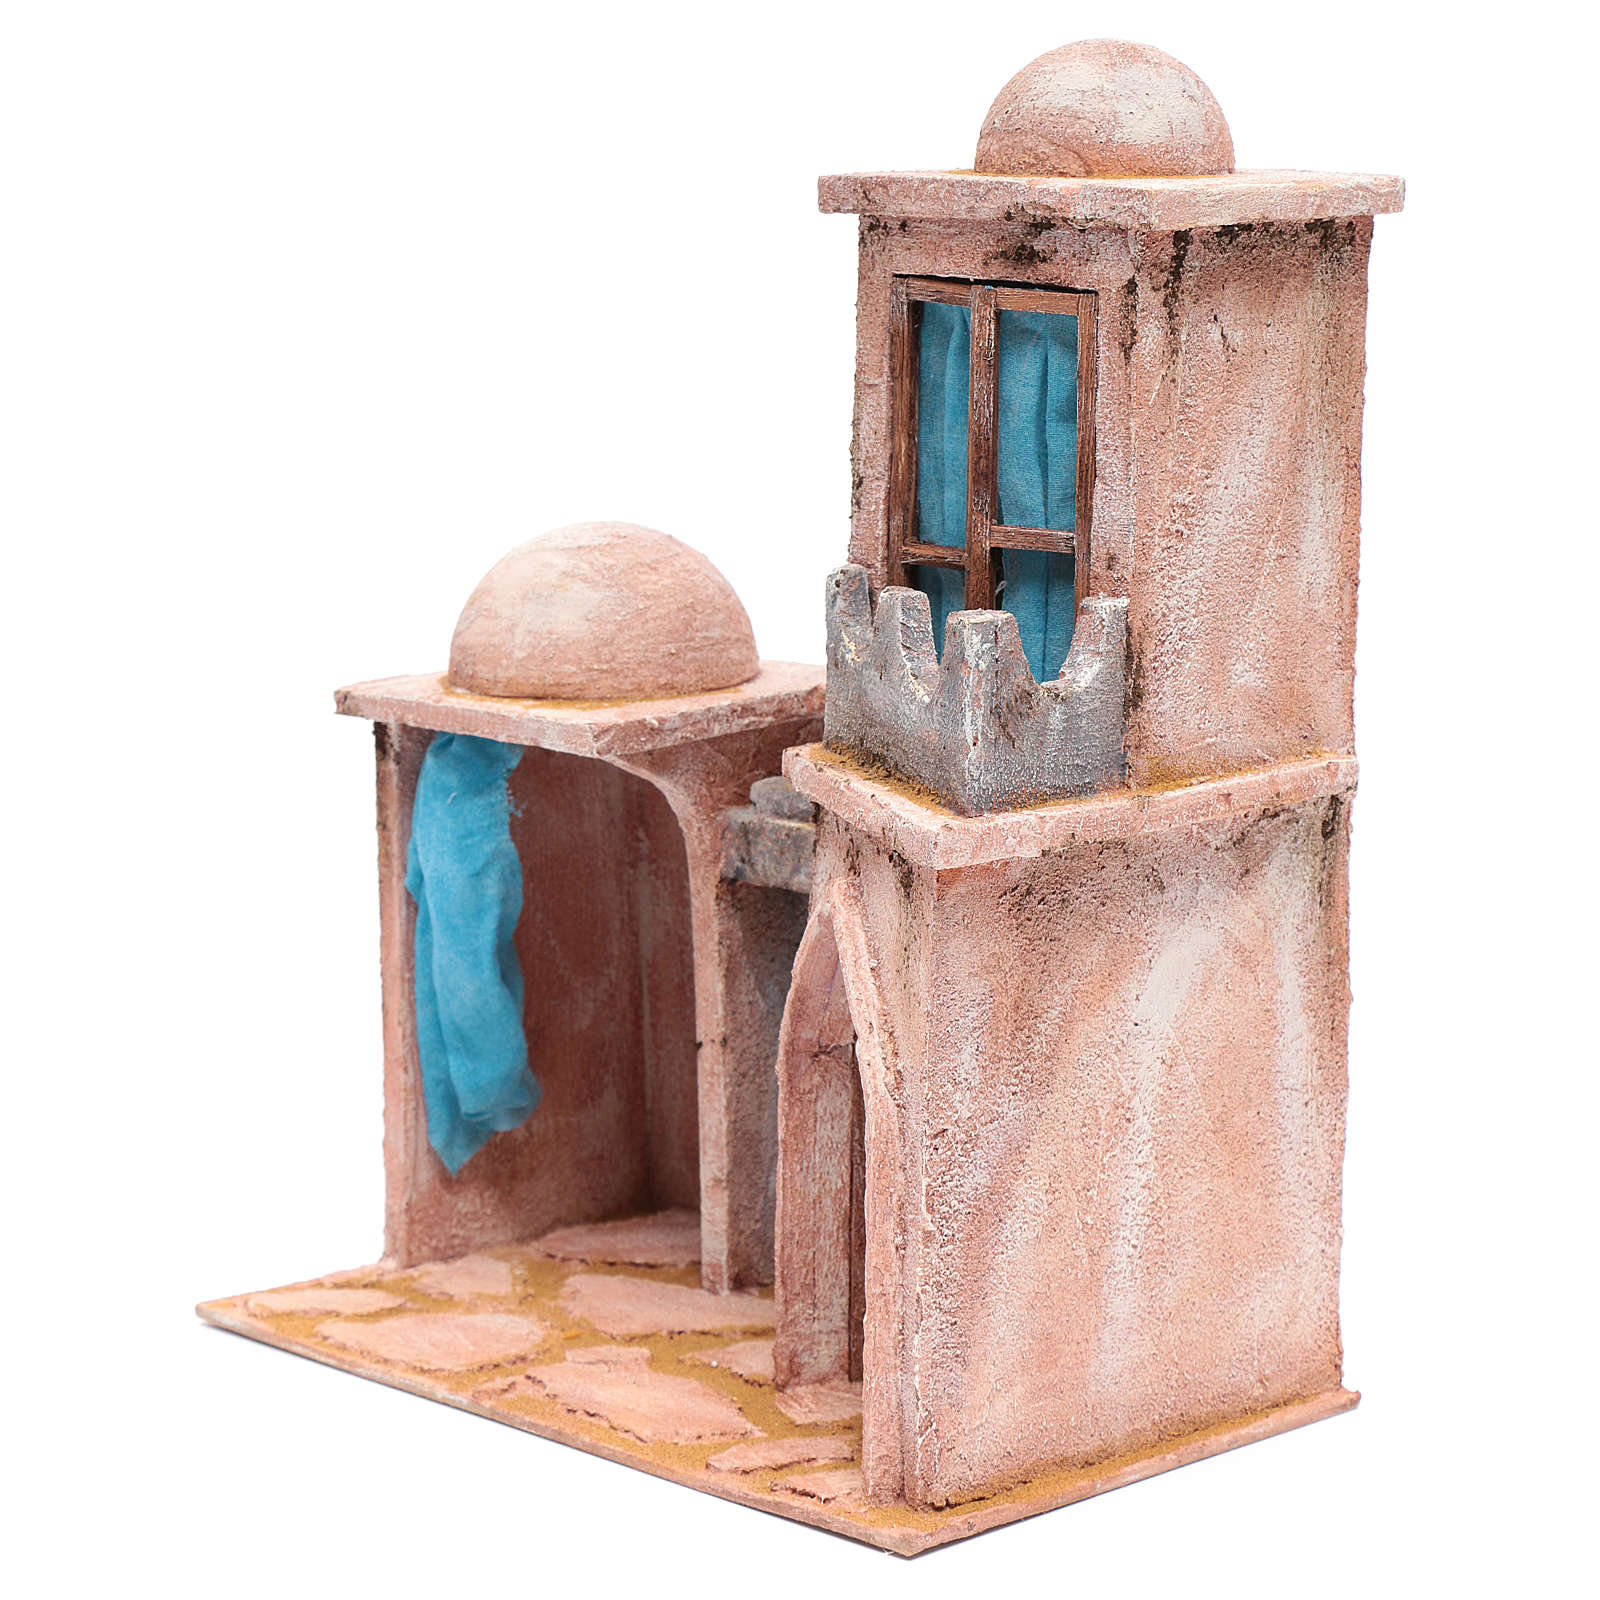 Casetta di stile arabo con balconcino 38x29x18 cm 4